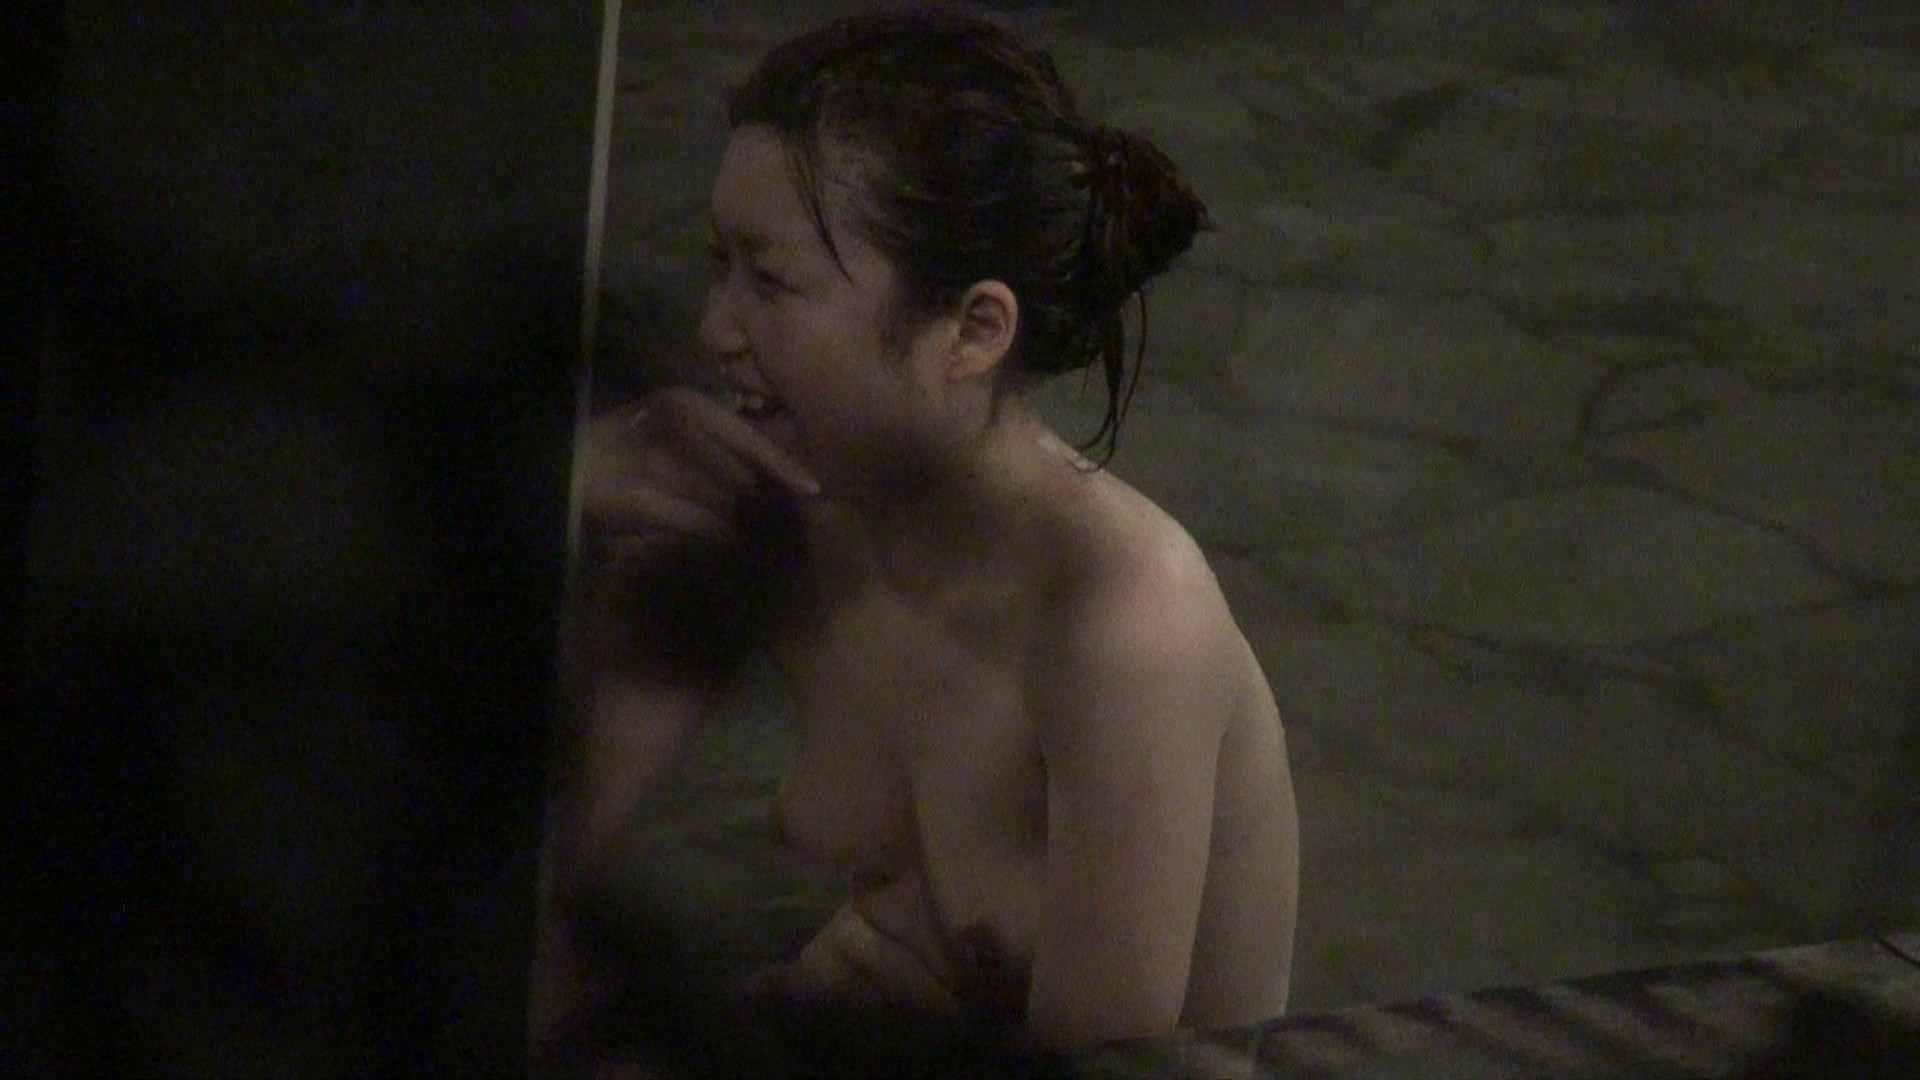 Aquaな露天風呂Vol.342 露天風呂突入 AV無料動画キャプチャ 107pic 17